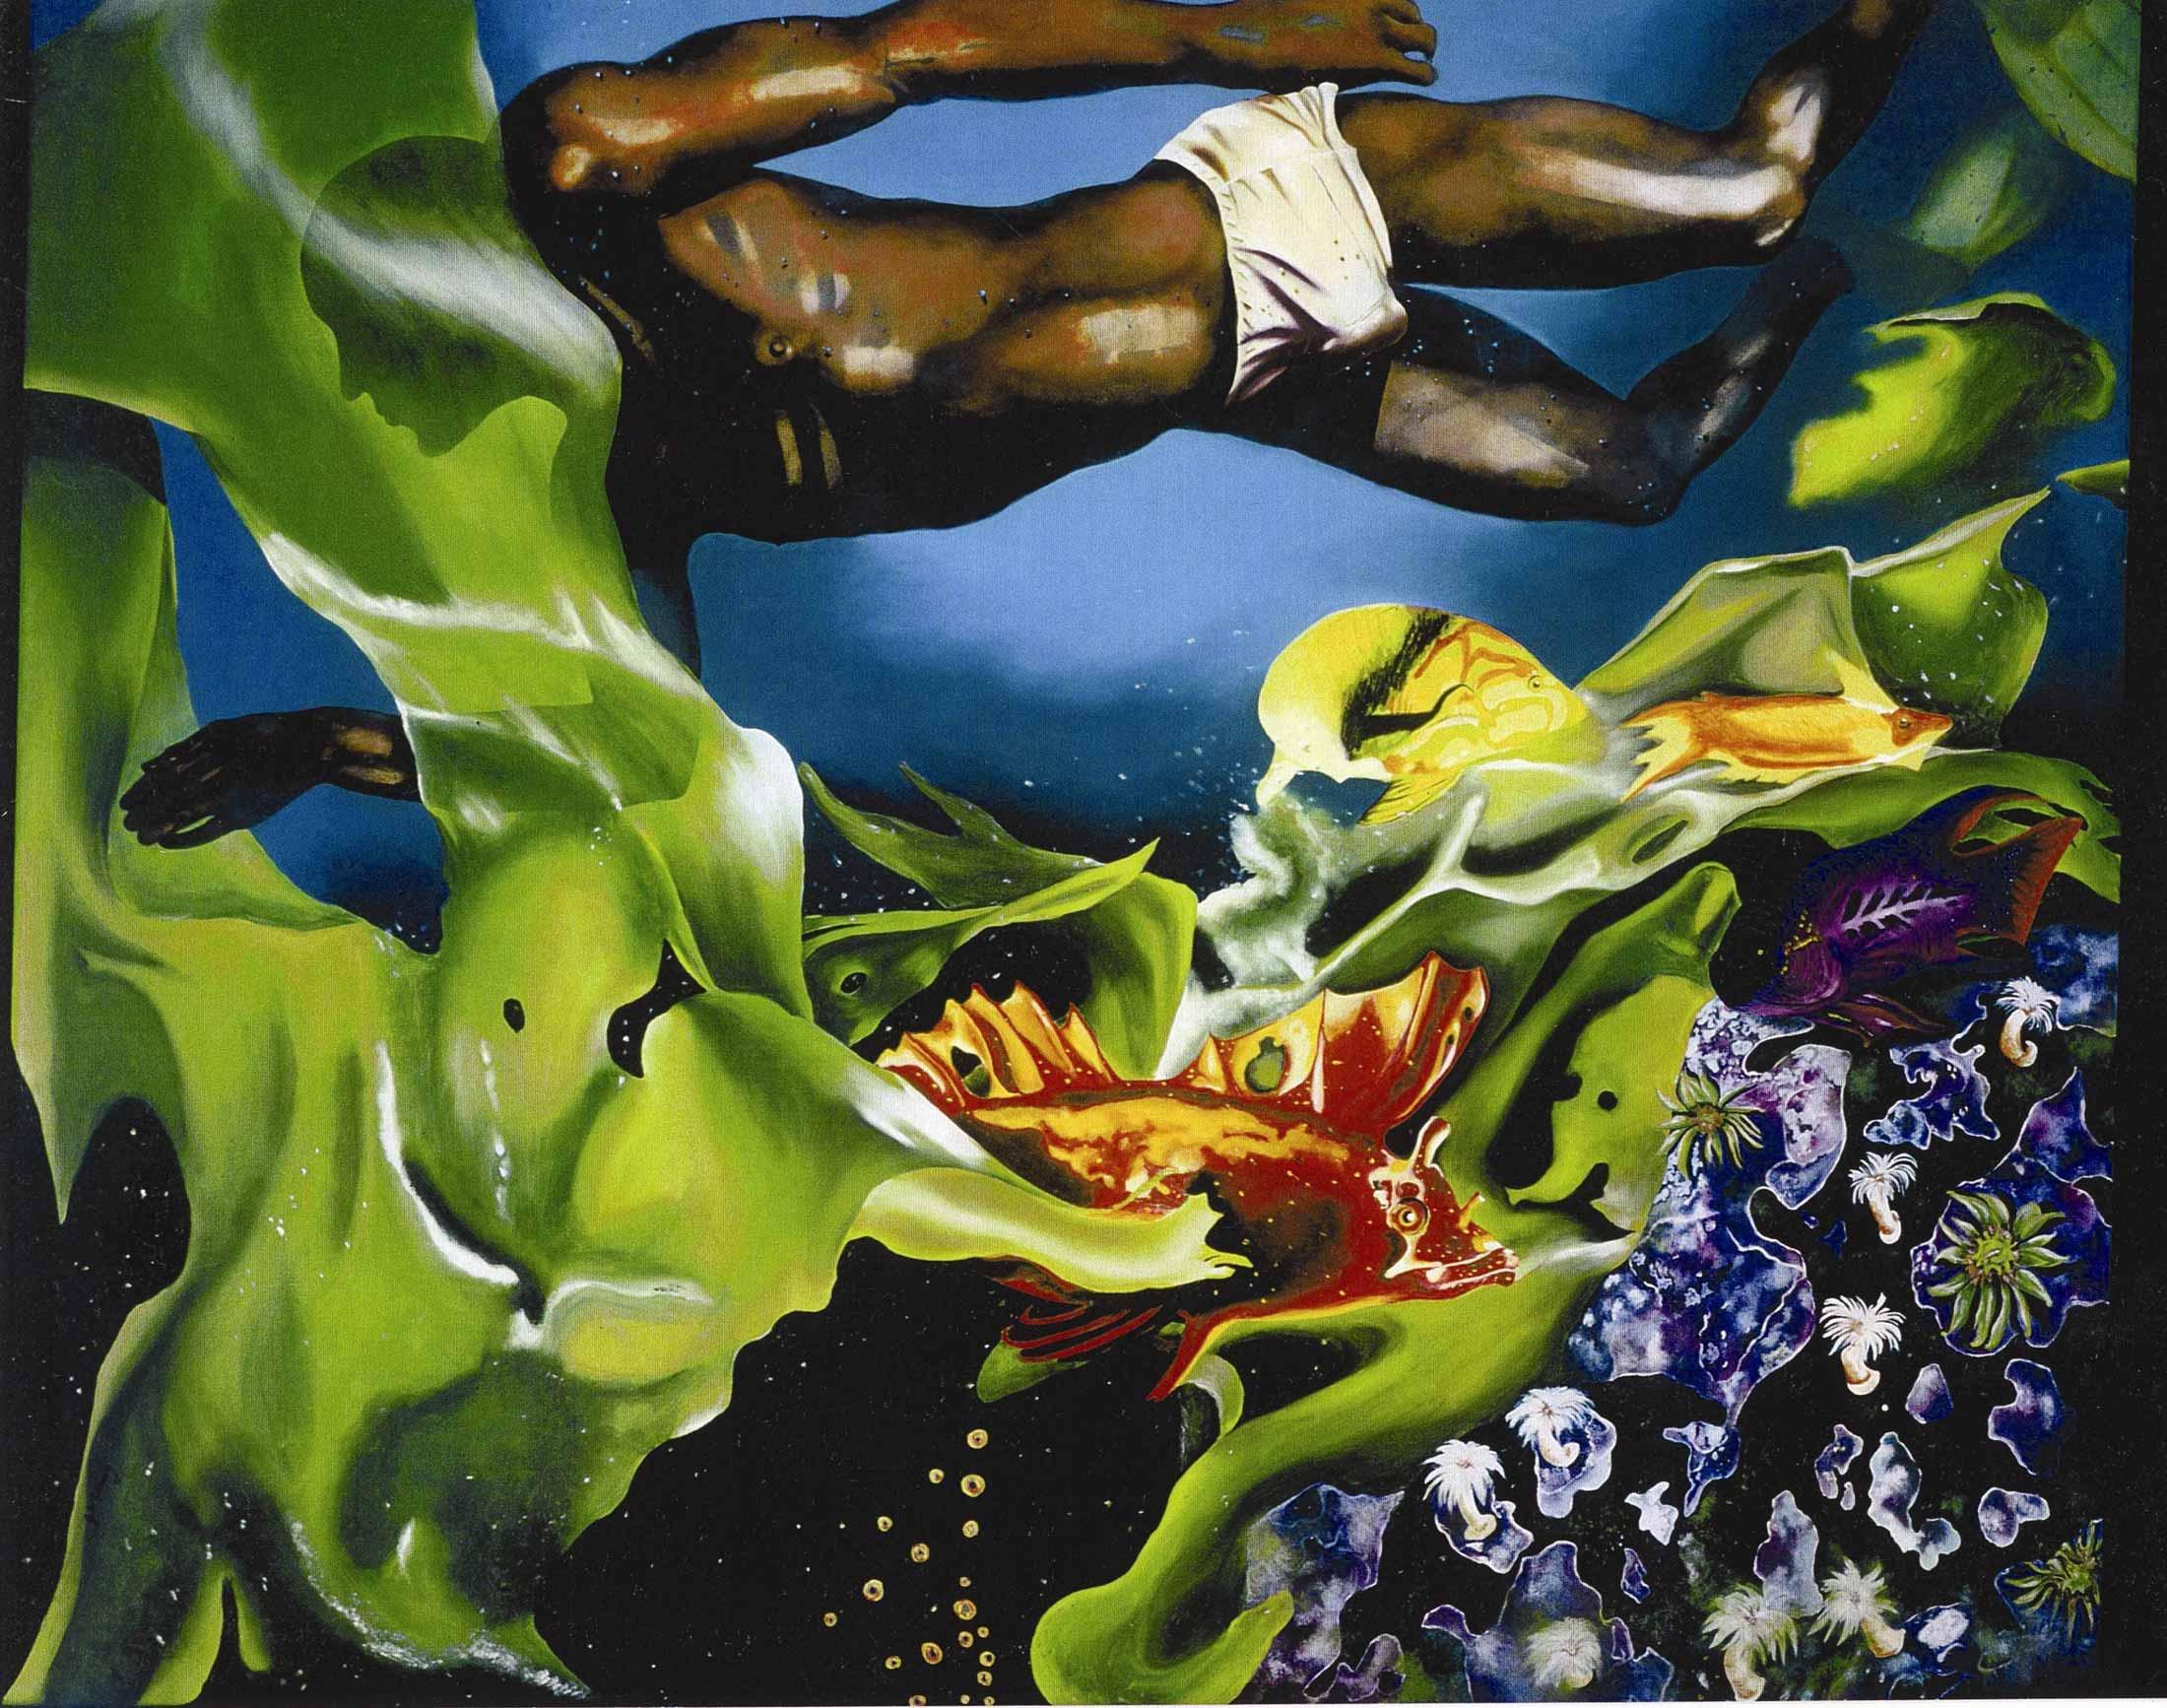 Disintegration and Rebirth